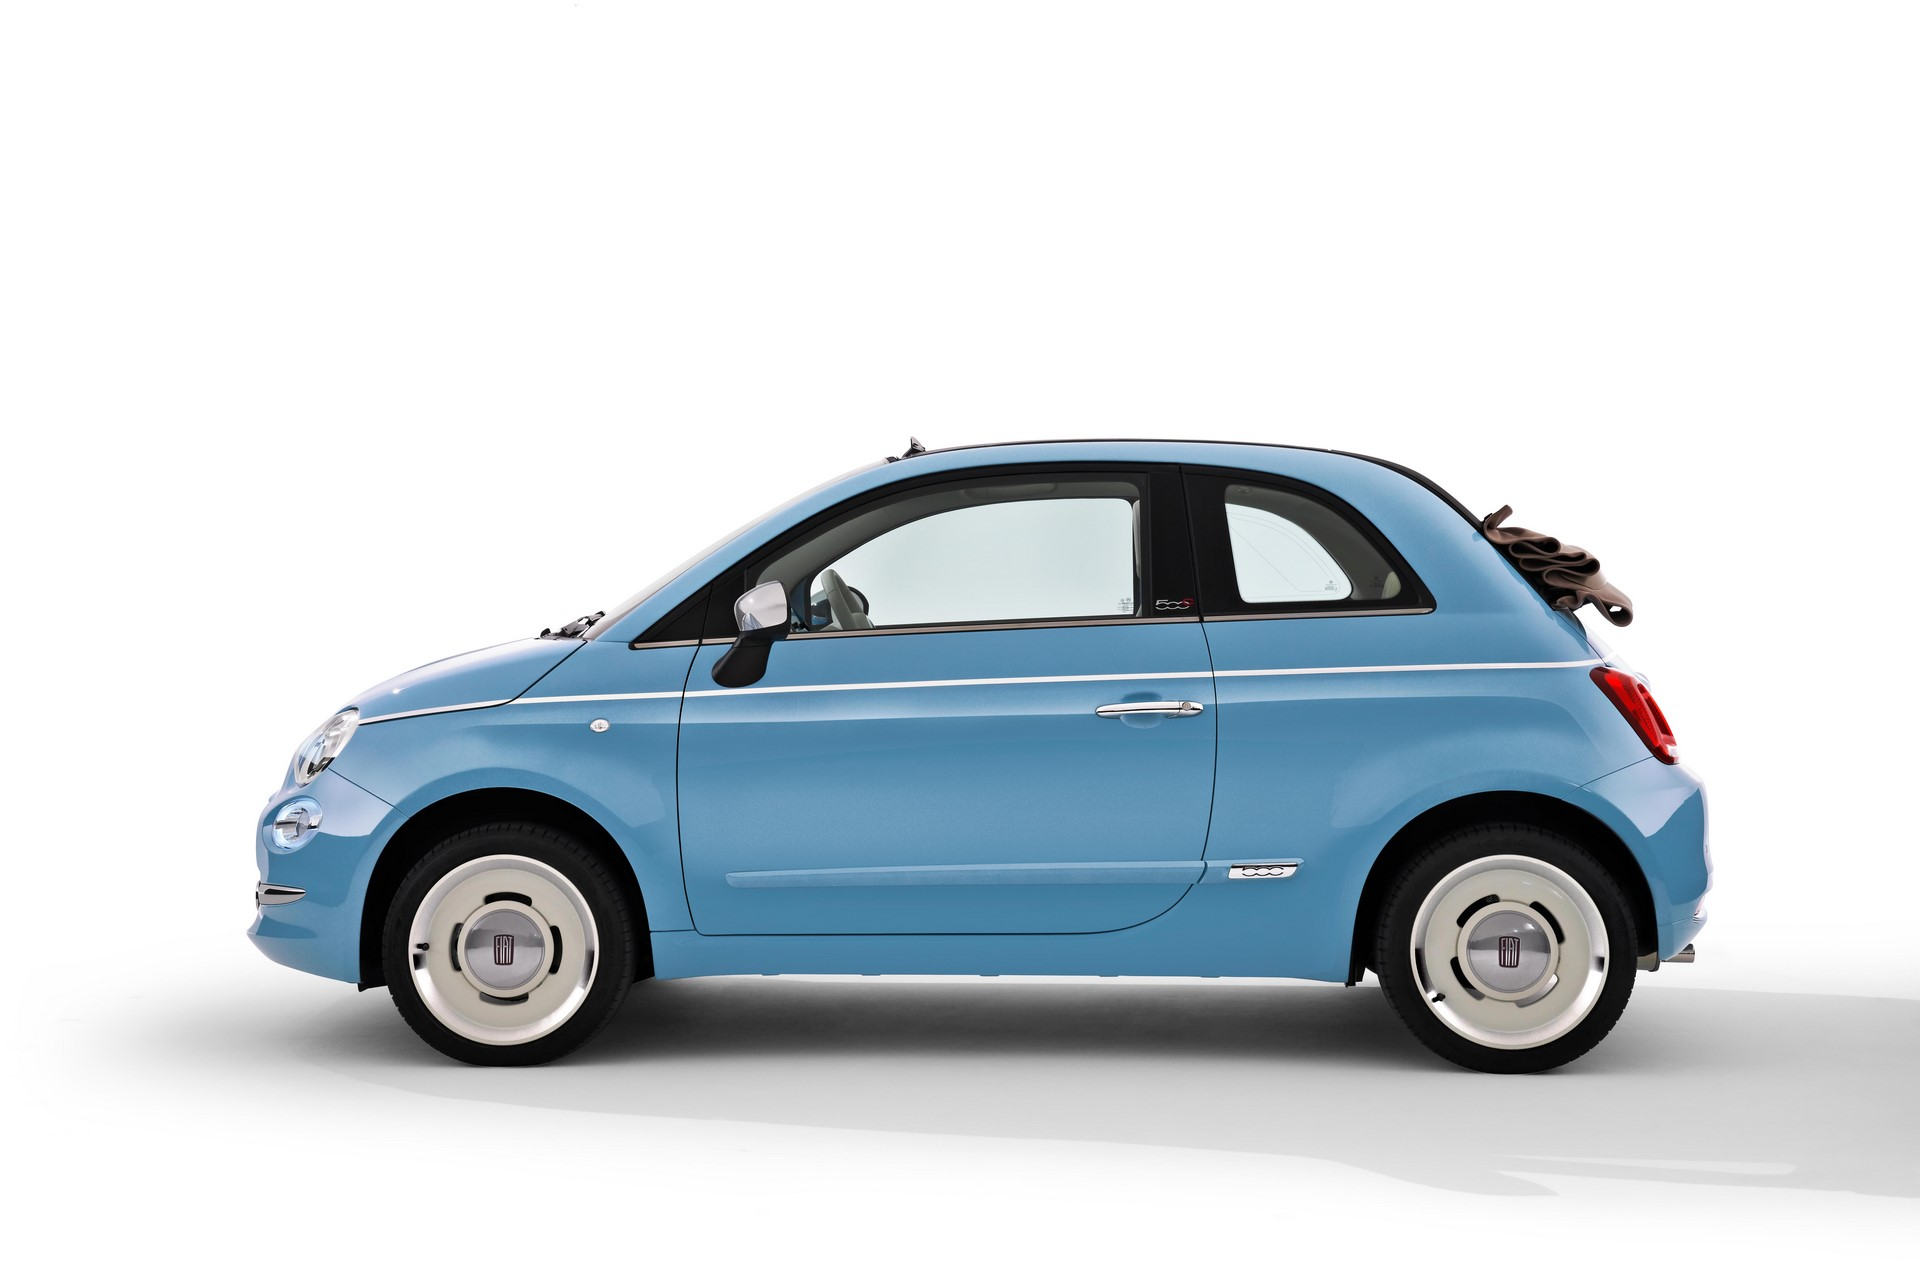 180704_Fiat_500-Spiaggina-58_17